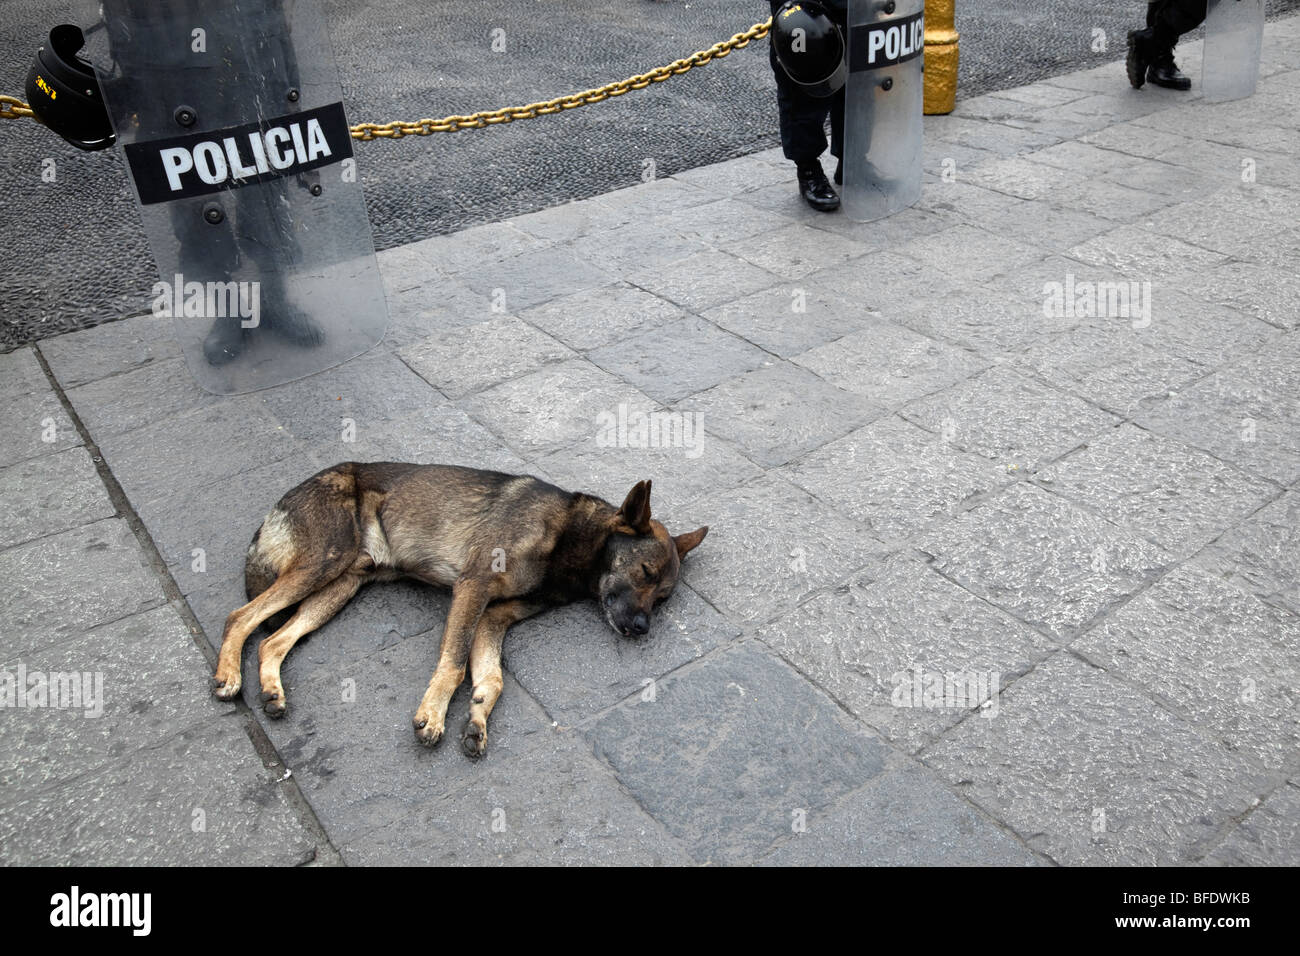 Mongrel dog asleep on pavement in front of Peruvian policemen, Plaza de Armas, Lima, Peru - Stock Image